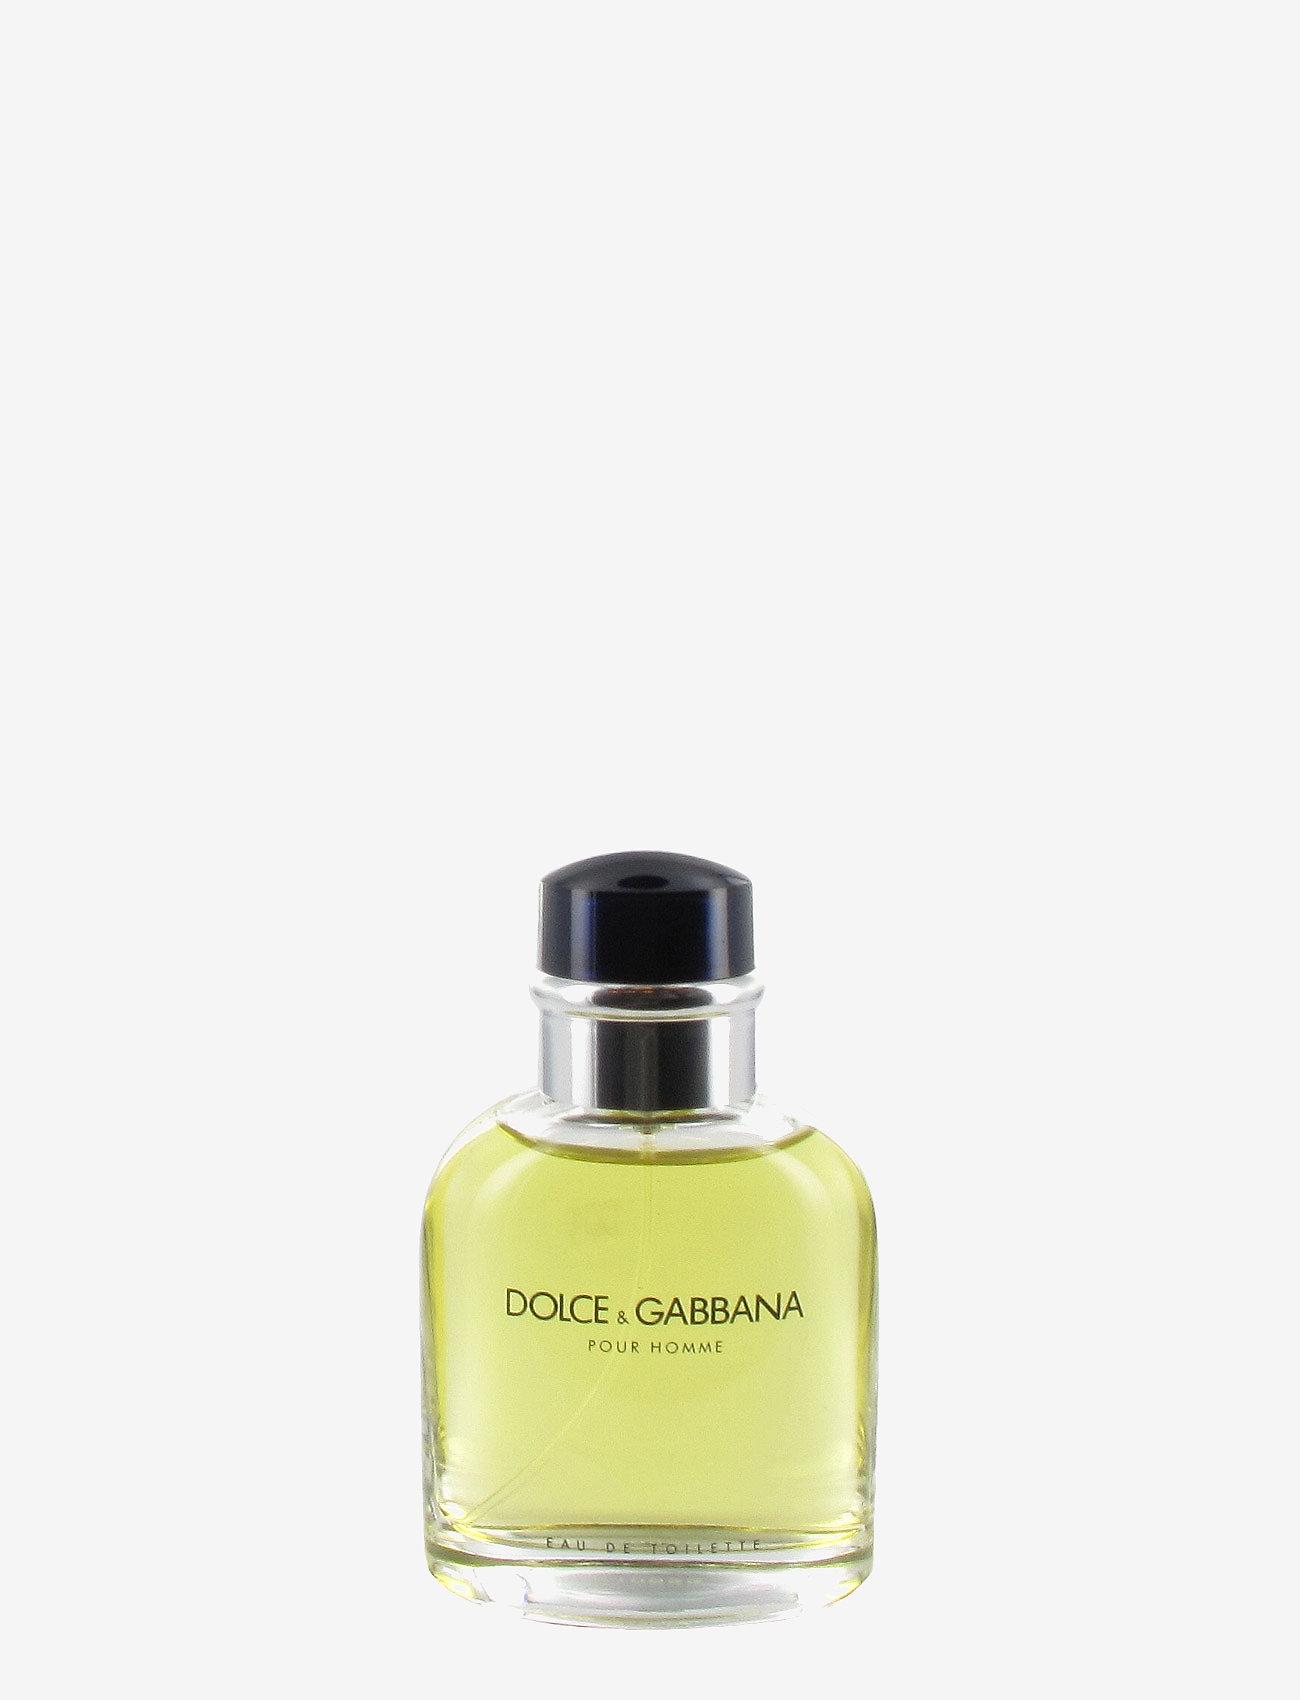 Dolce Gabbana Dolce & Gabbana Pour Homme EdT 40ml | Parfym